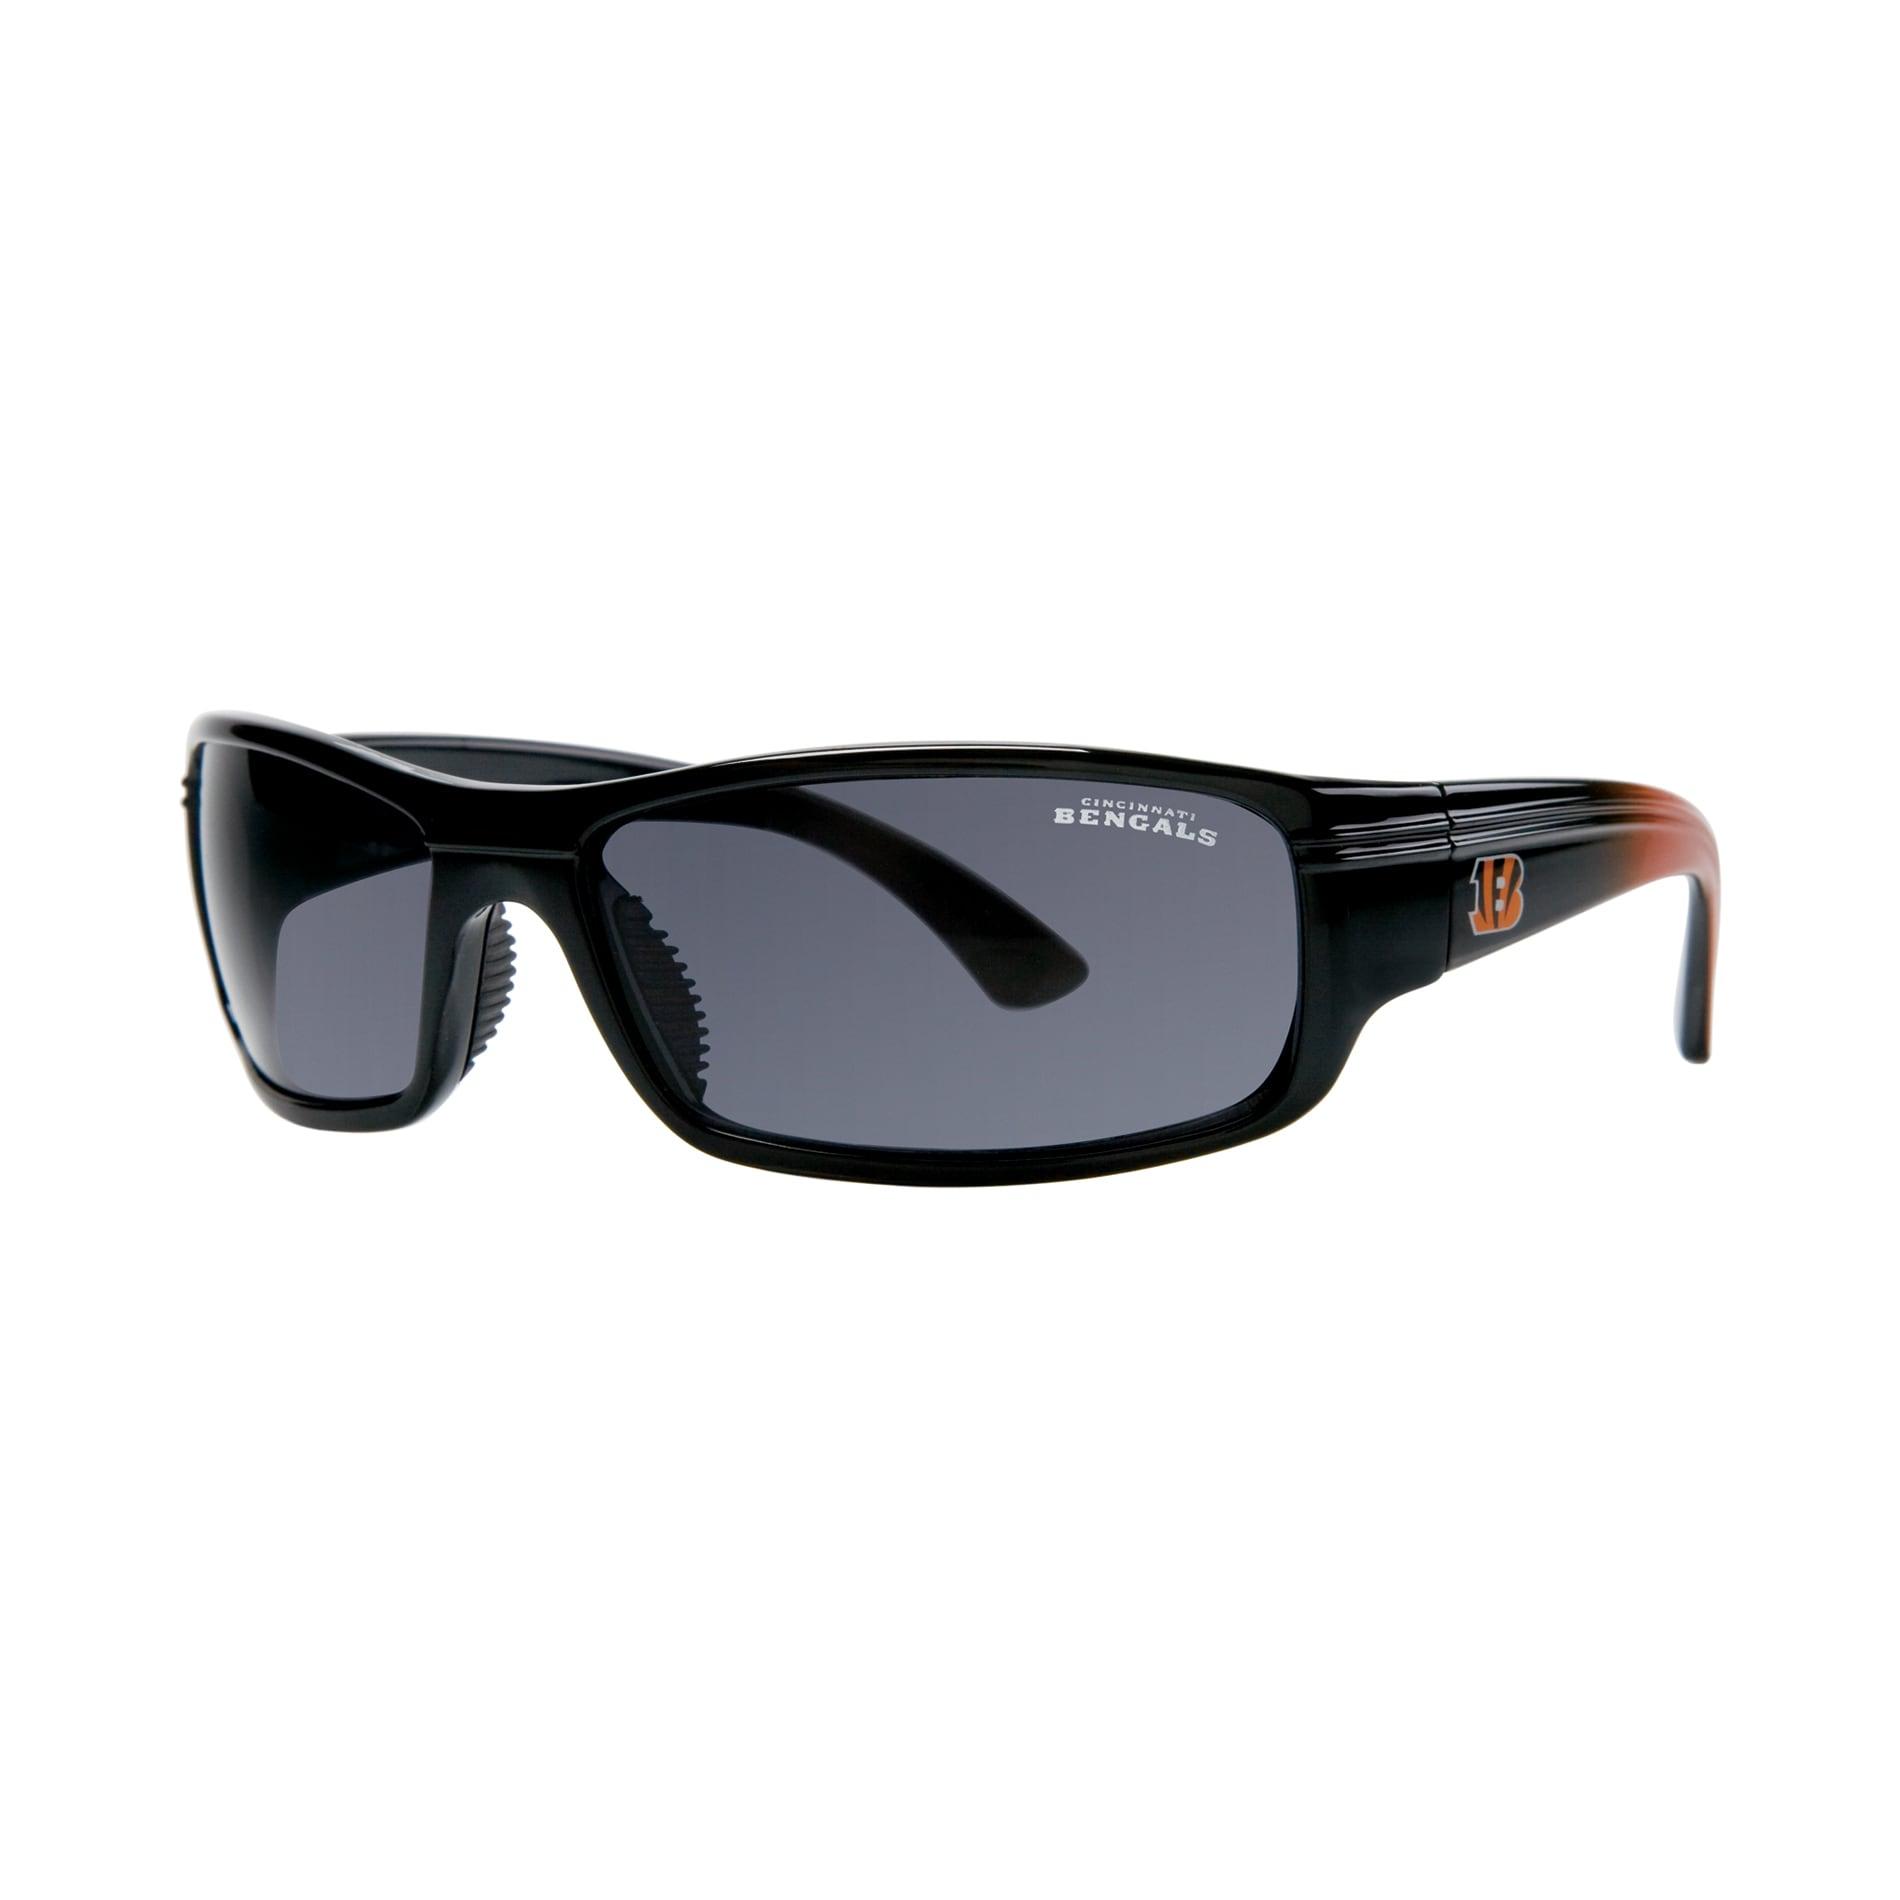 Modo Cincinnati Bengals Men's 'Block 2' Sunglasses